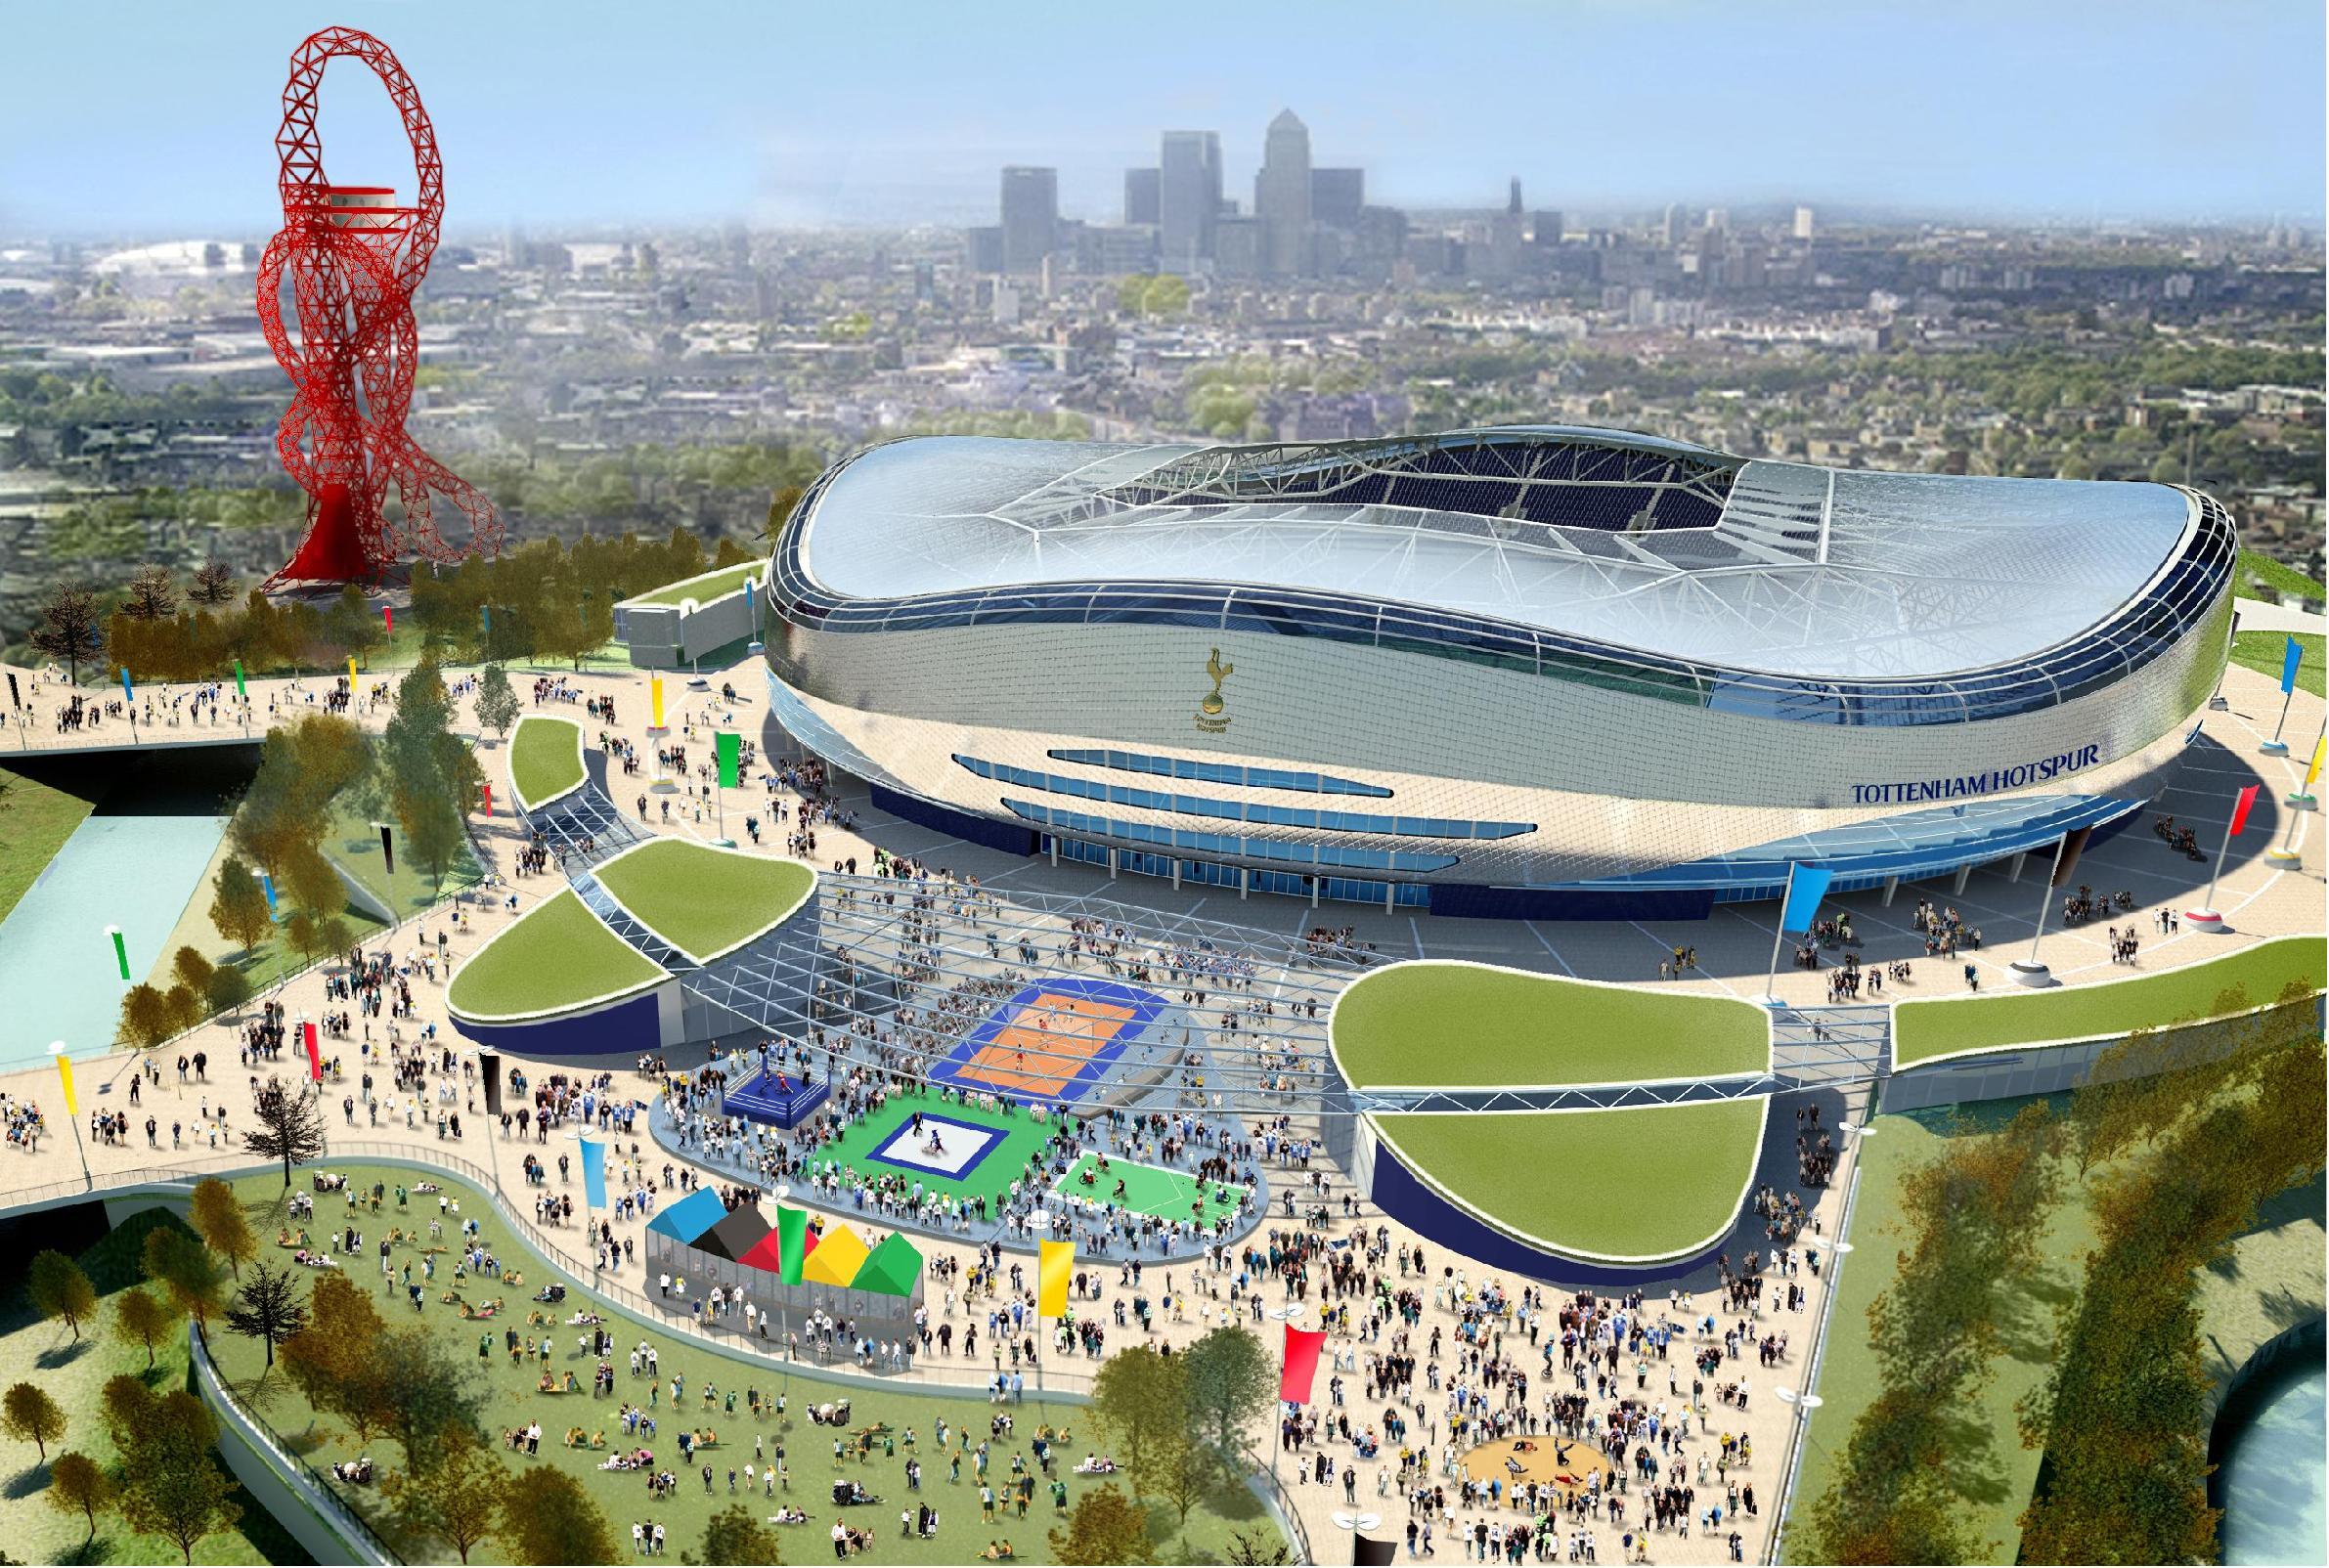 Olympic_Stadium_in_Tottenham_mode_February_2011